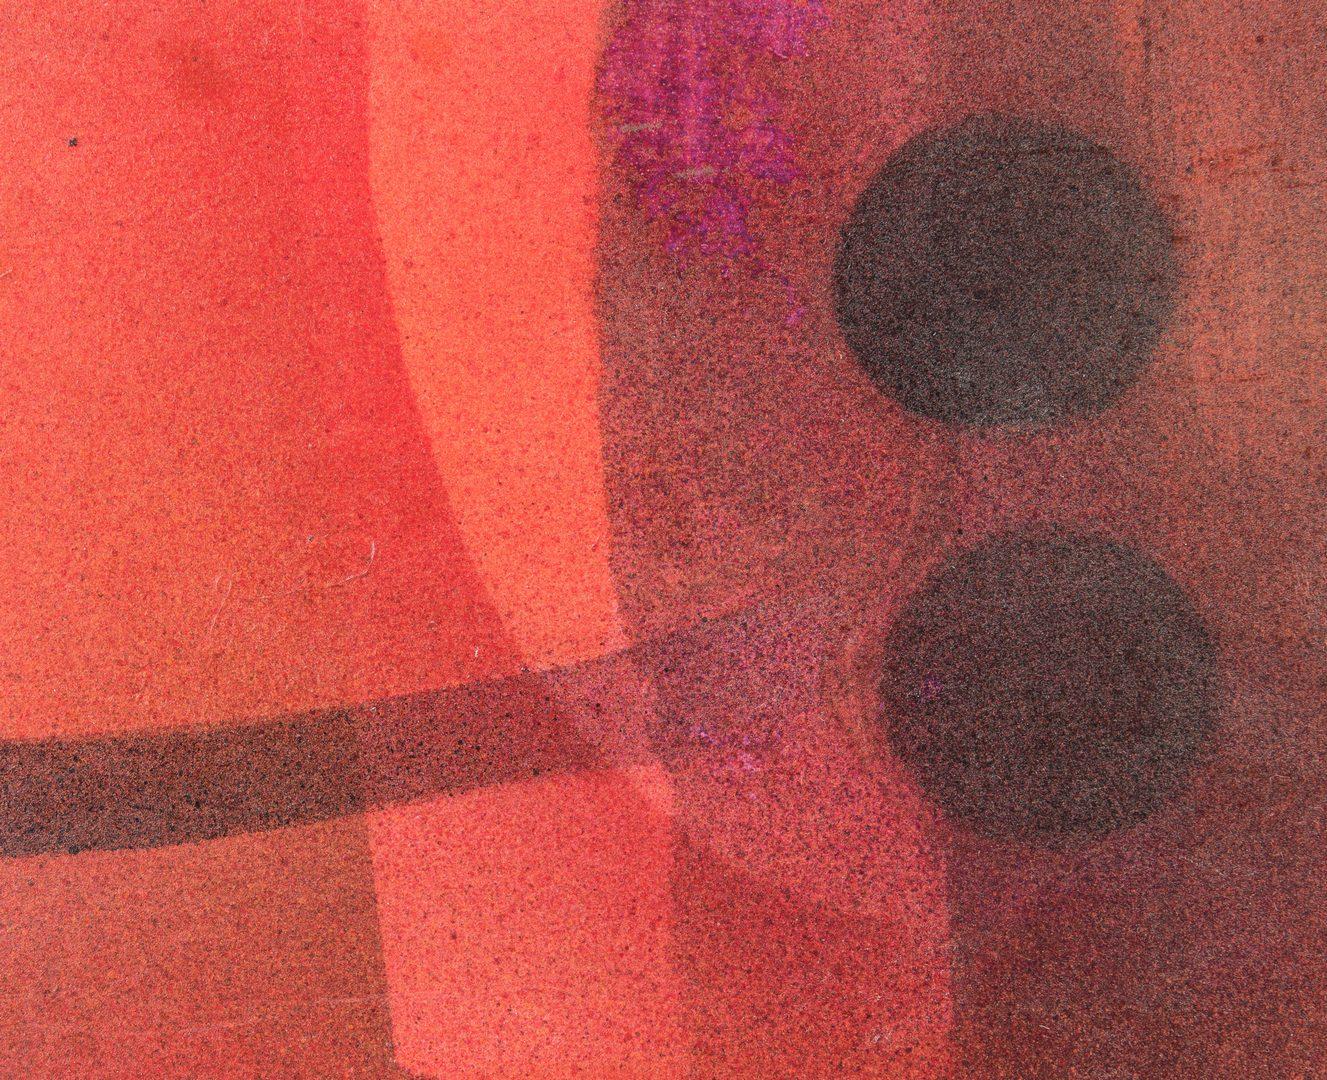 Lot 241: 2 Abstract Paintings, Okoshi and Tejada